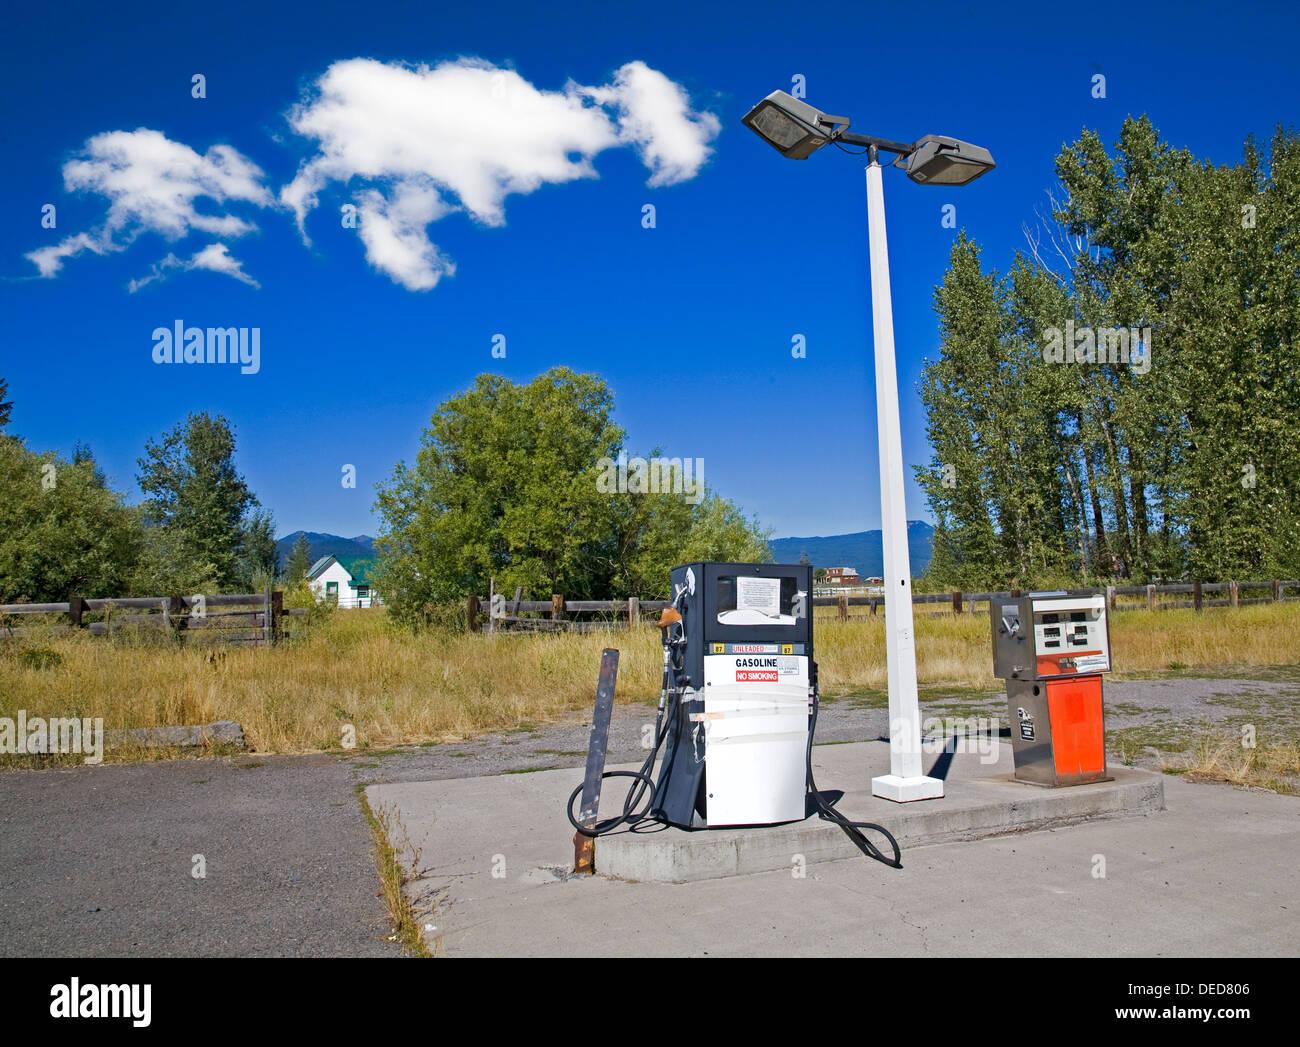 Battered gas pumps at an abandoned service station in Fort Klamath, Oregon - Stock Image